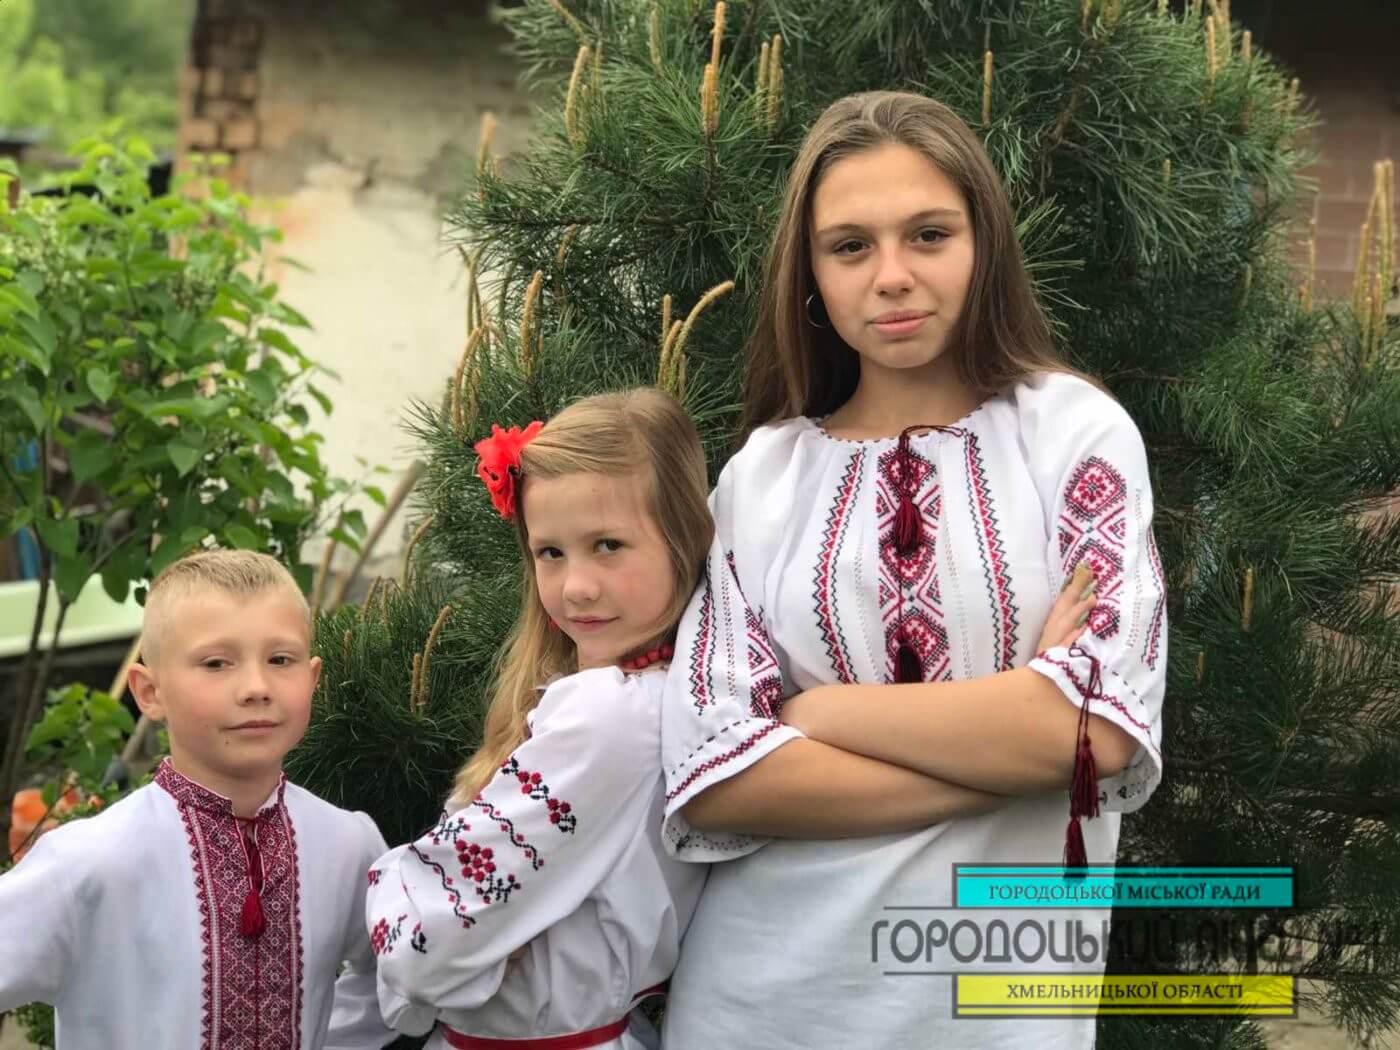 zobrazhennya viber 2020 05 21 10 18 592 1400x1050 - День Вишиванки - ДЕНЬ РОДОВОДУ